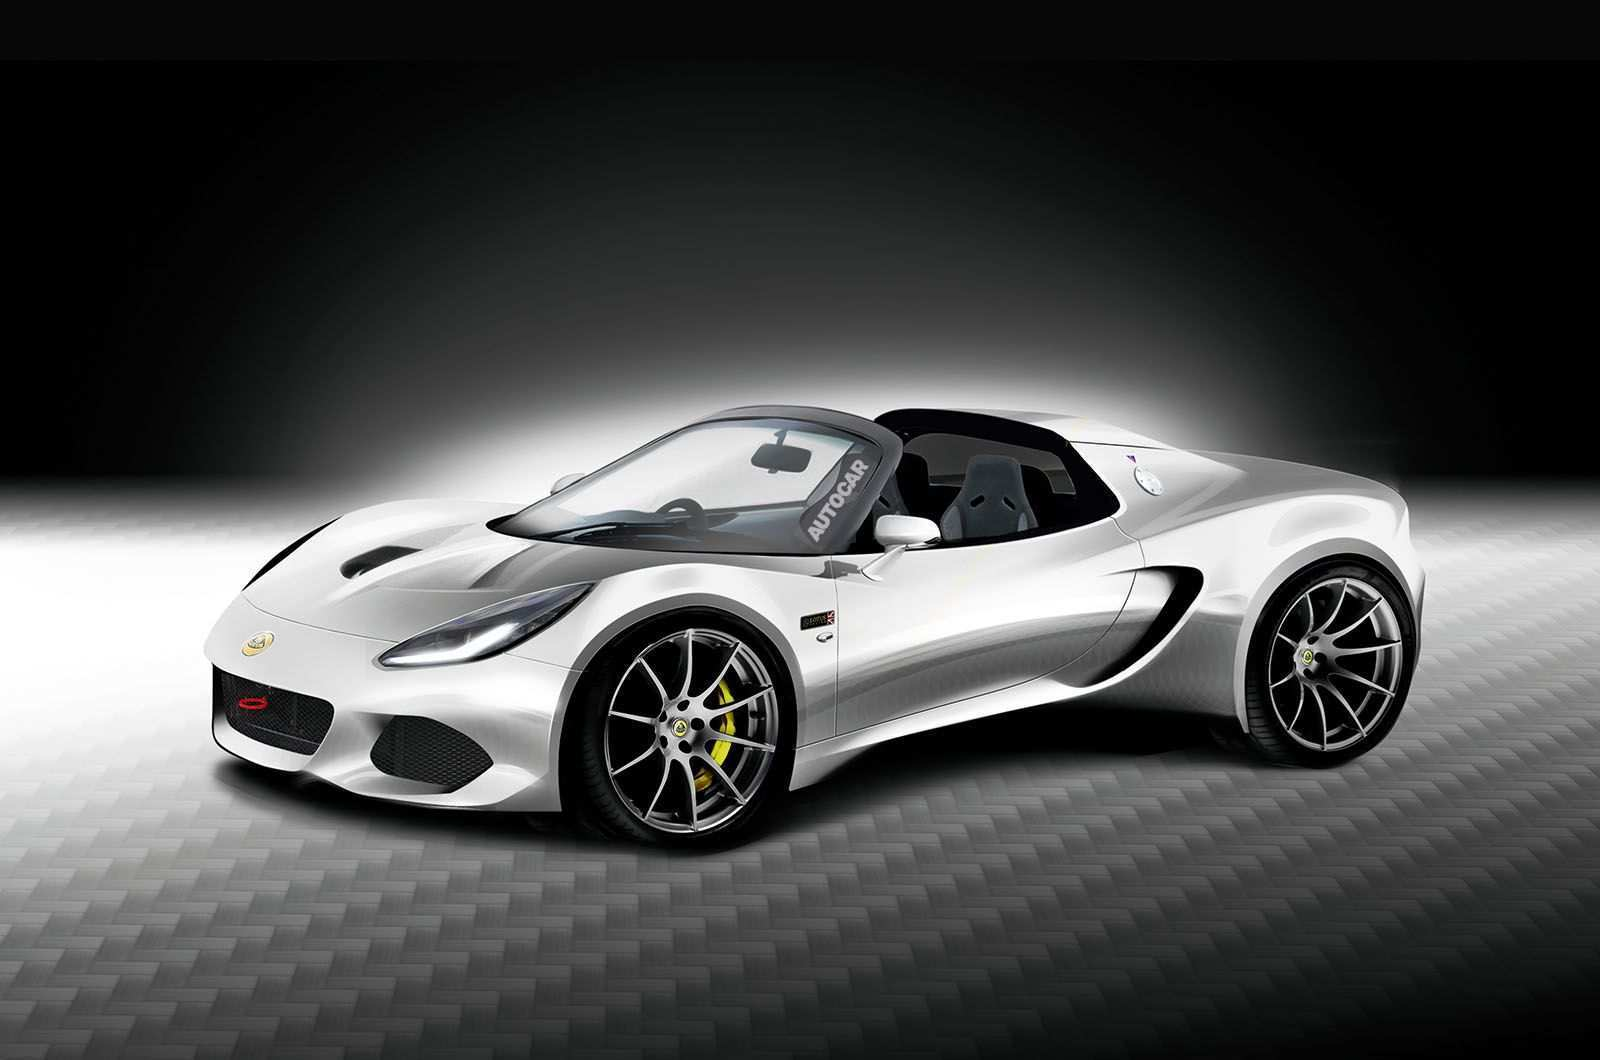 41 New 2020 The Lotus Evora Ratings for 2020 The Lotus Evora